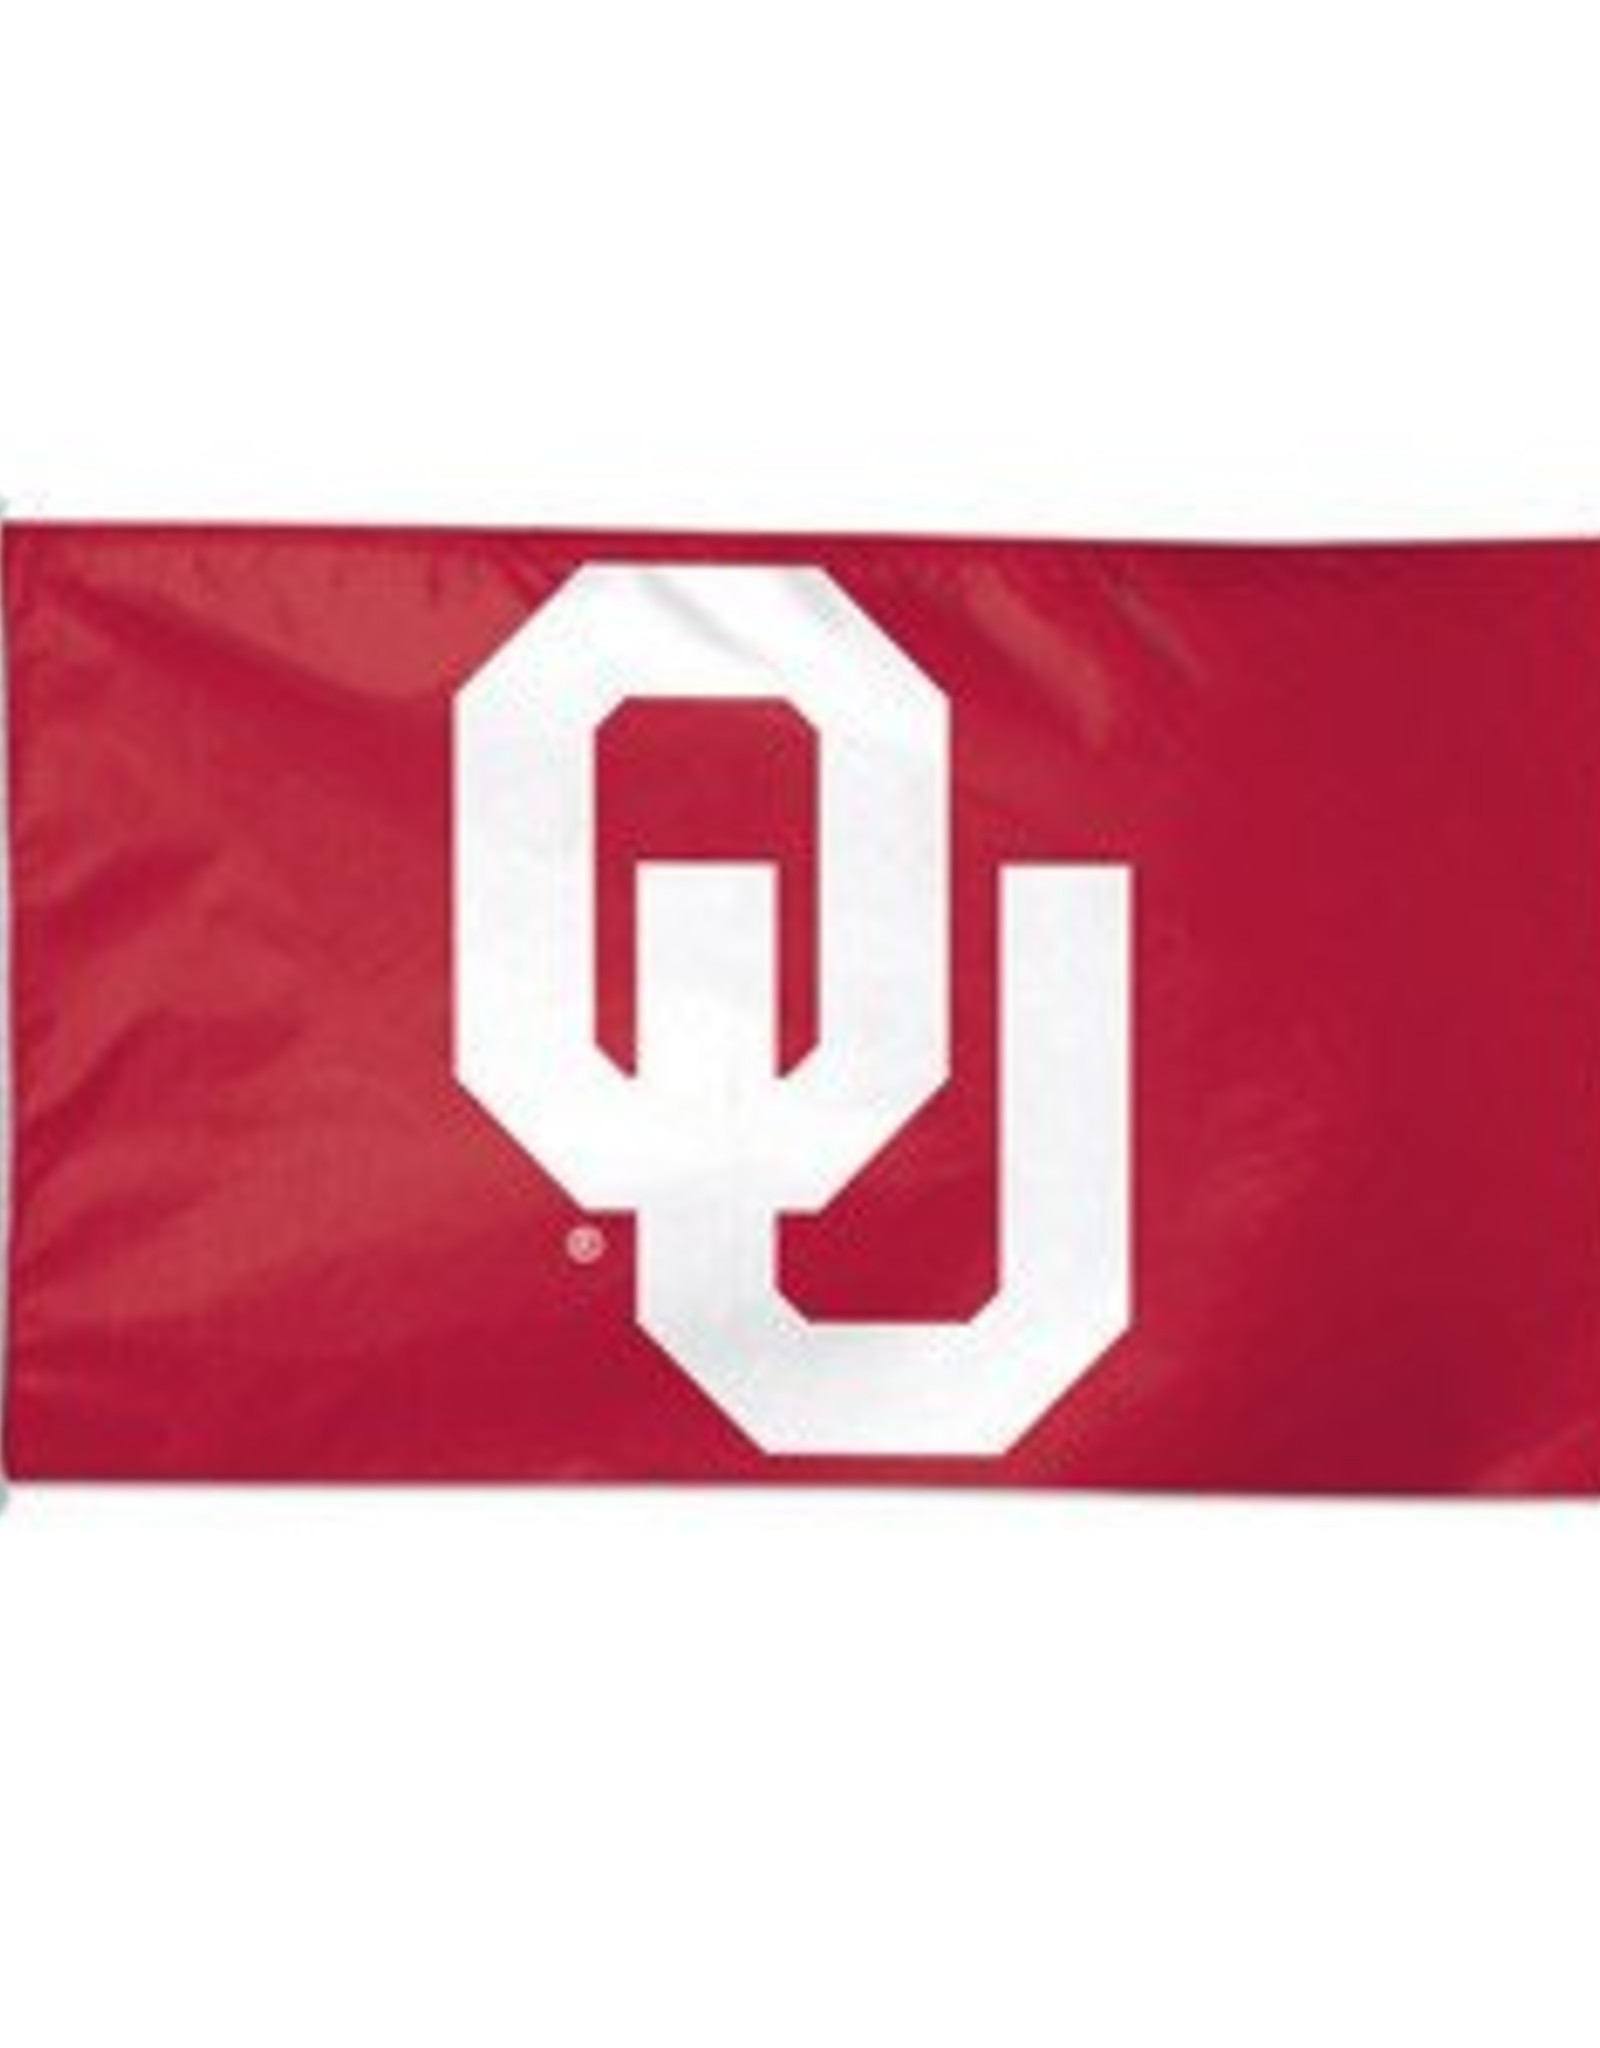 Sewing Concepts OU Crimson/White 3'x5' Applique  Flag (A)